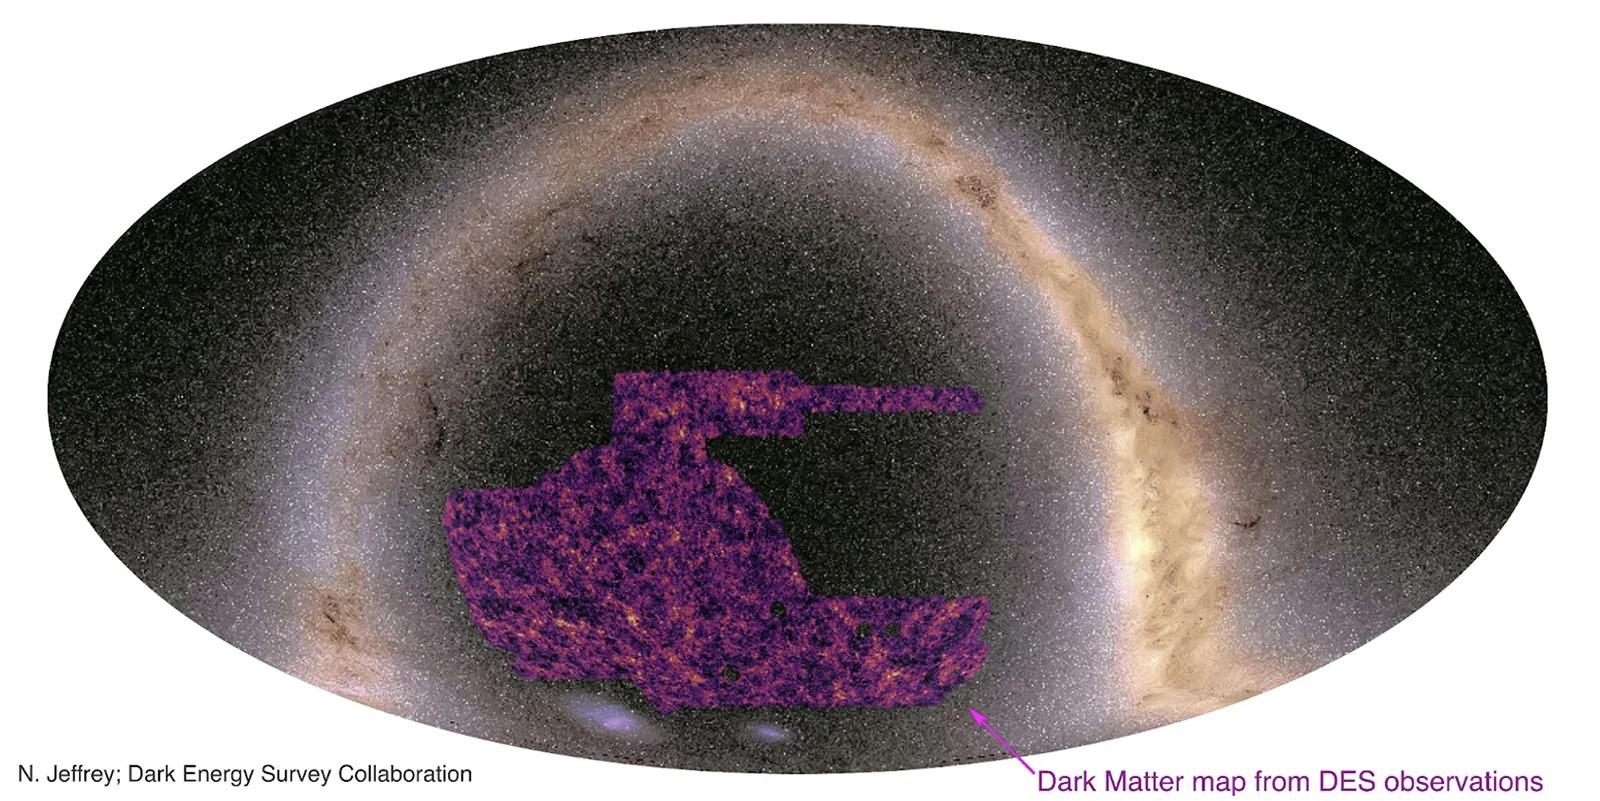 N. Jeffrey et. al/Dark Energy Survey Collaboration